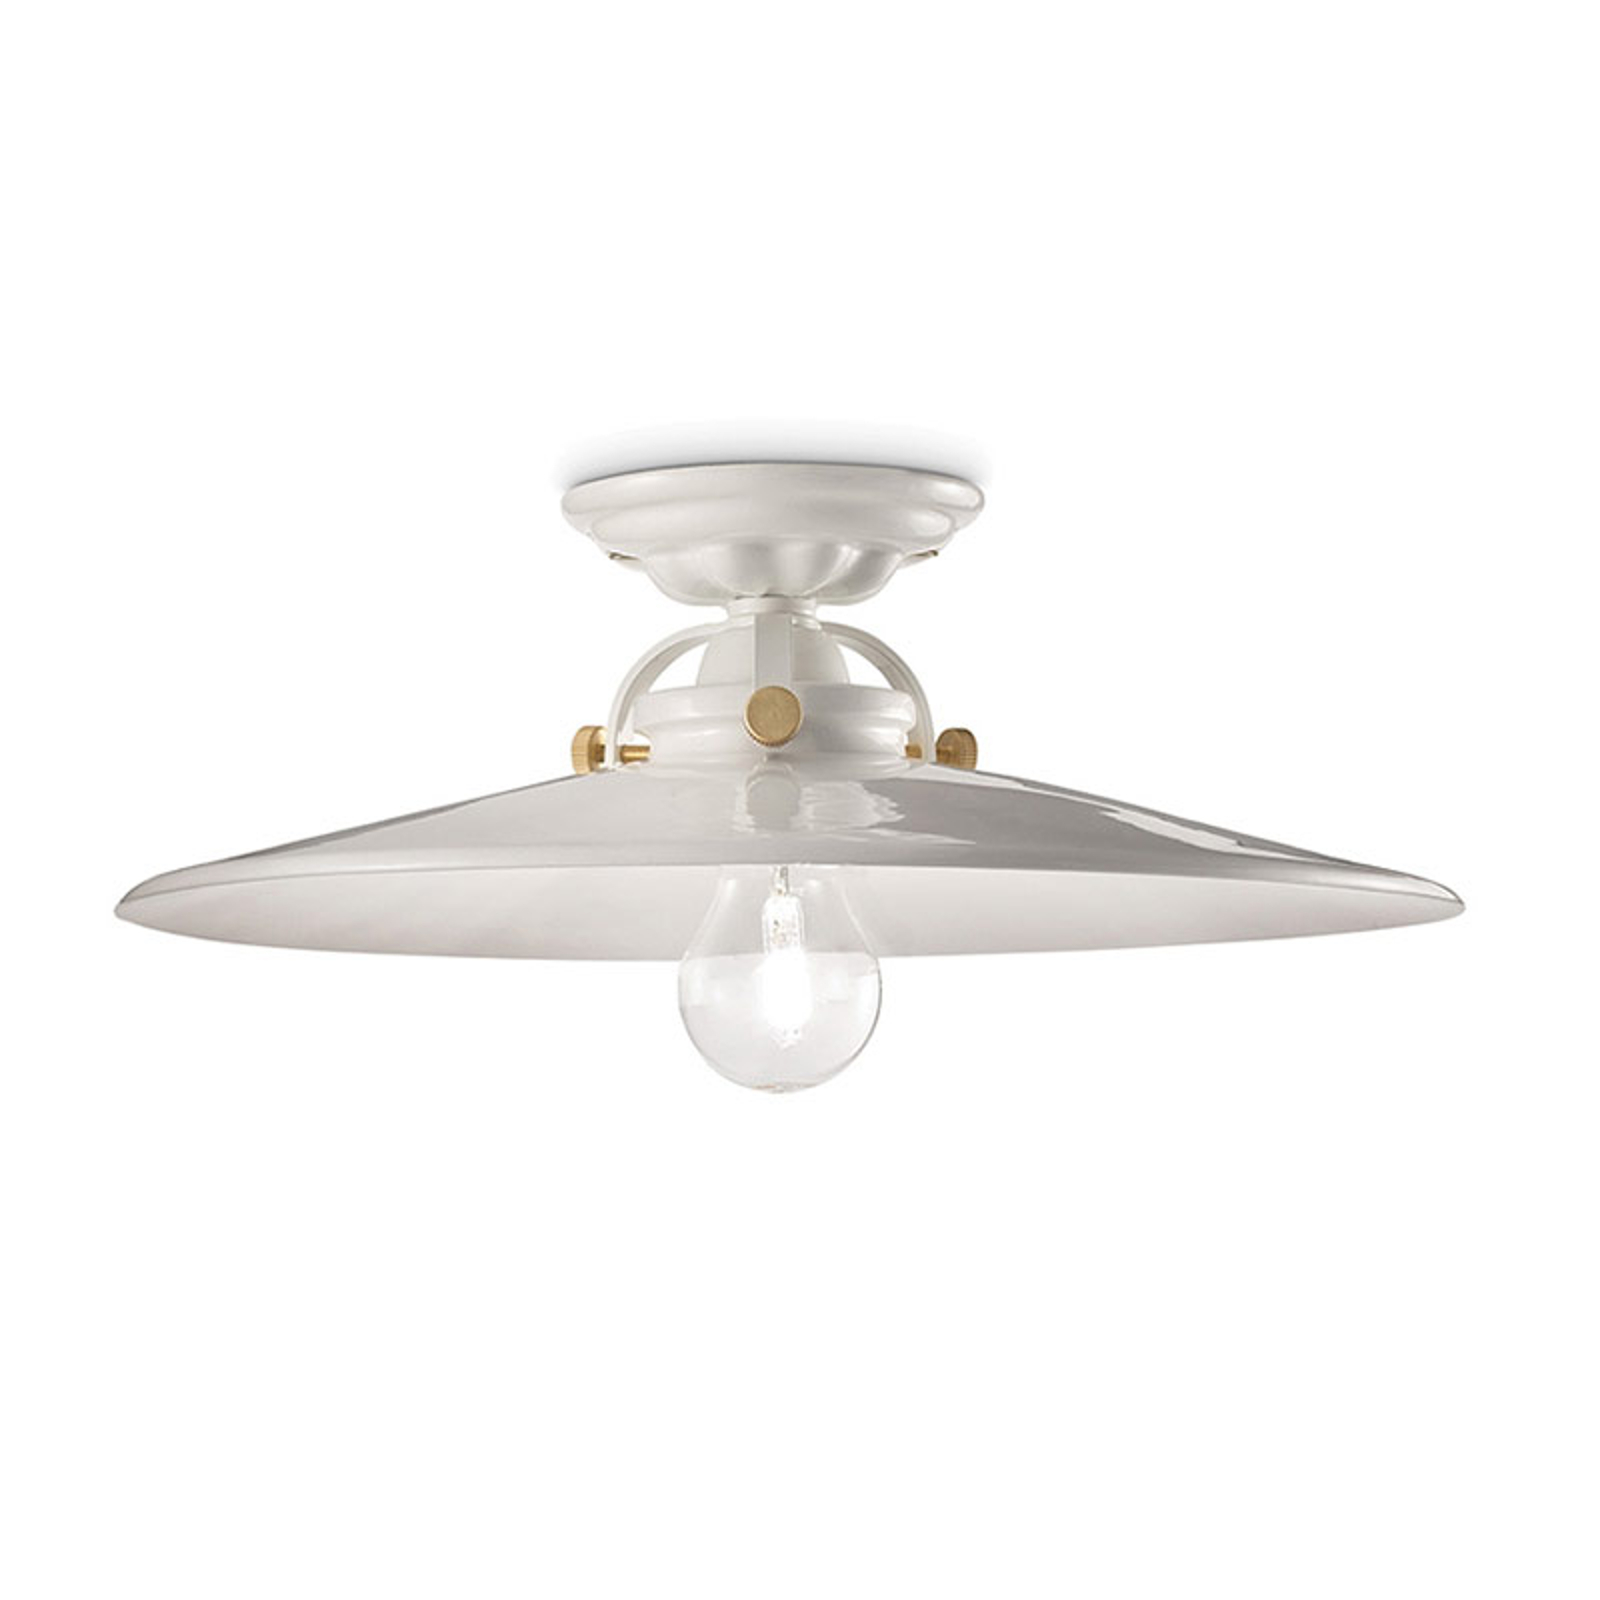 Lampa sufitowa Retro C105, biała